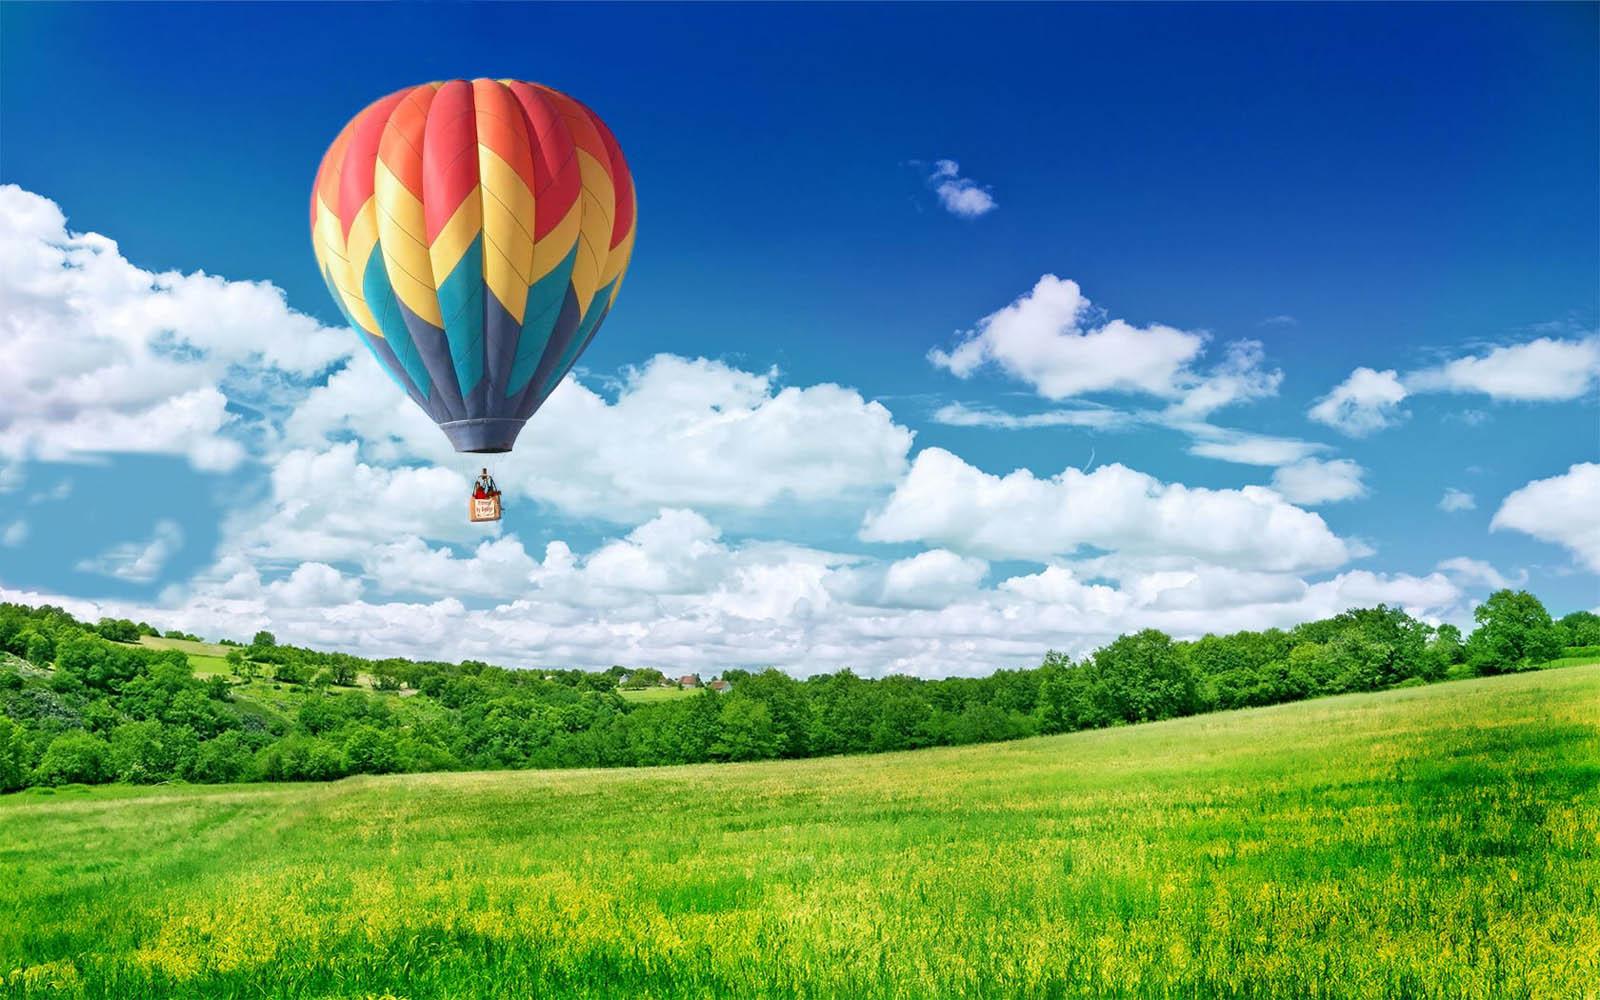 Gambar gambar balon udara yang cantik wallpaper